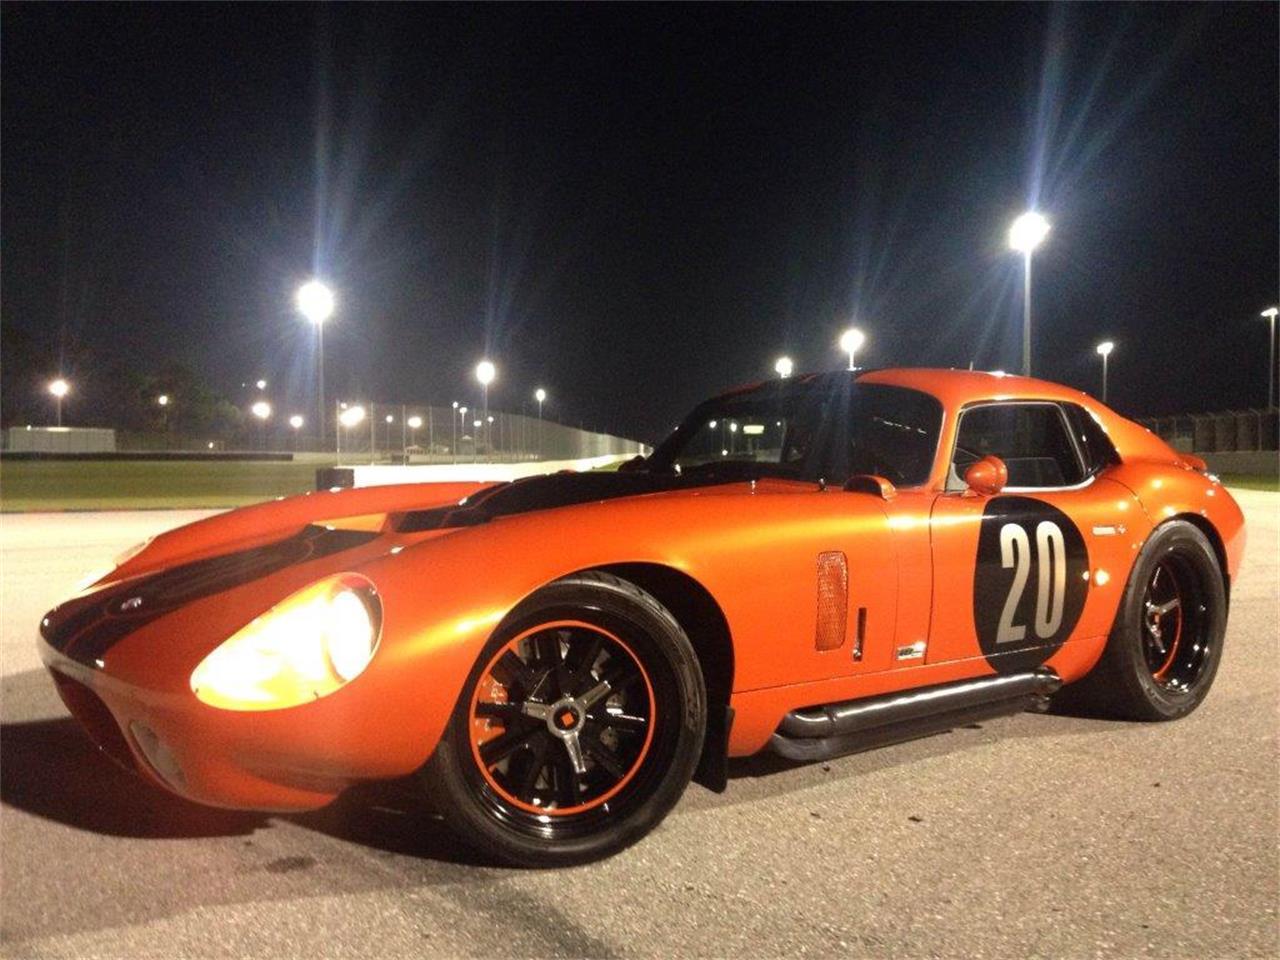 1964 Shelby Daytona (CC-1197141) for sale in North Miami, Florida